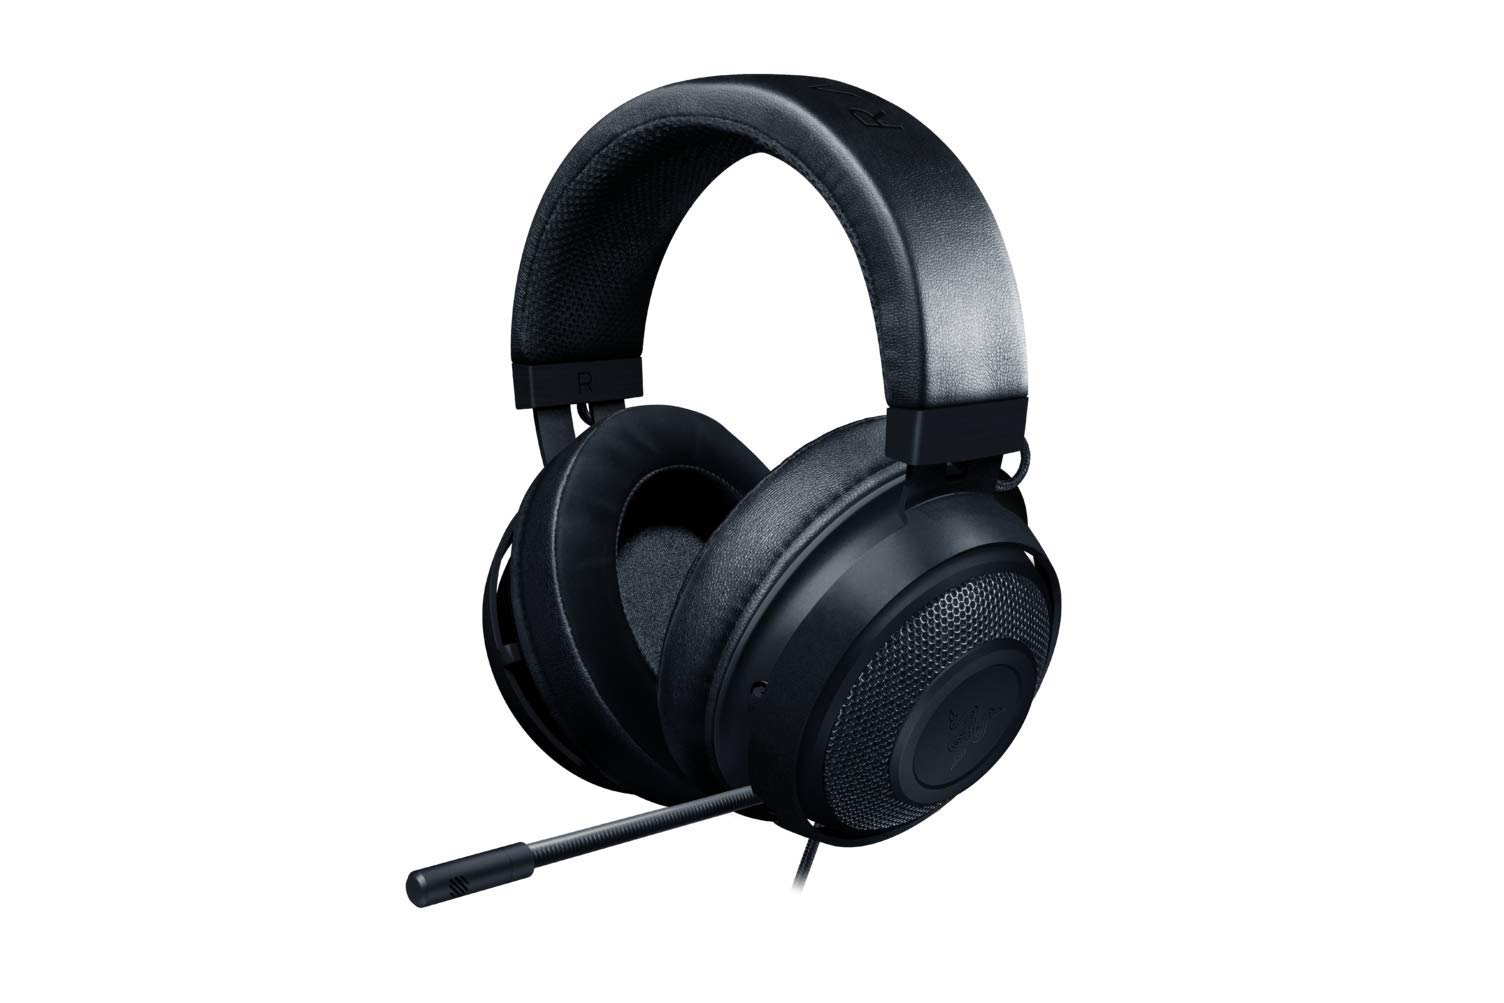 Razer Kraken Gaming Headset 2019 - [Matte Black]: Lightweight Aluminum Frame - Retractable Noise Cancelling Mic - for PC, Xbox, PS4, Nintendo Switch